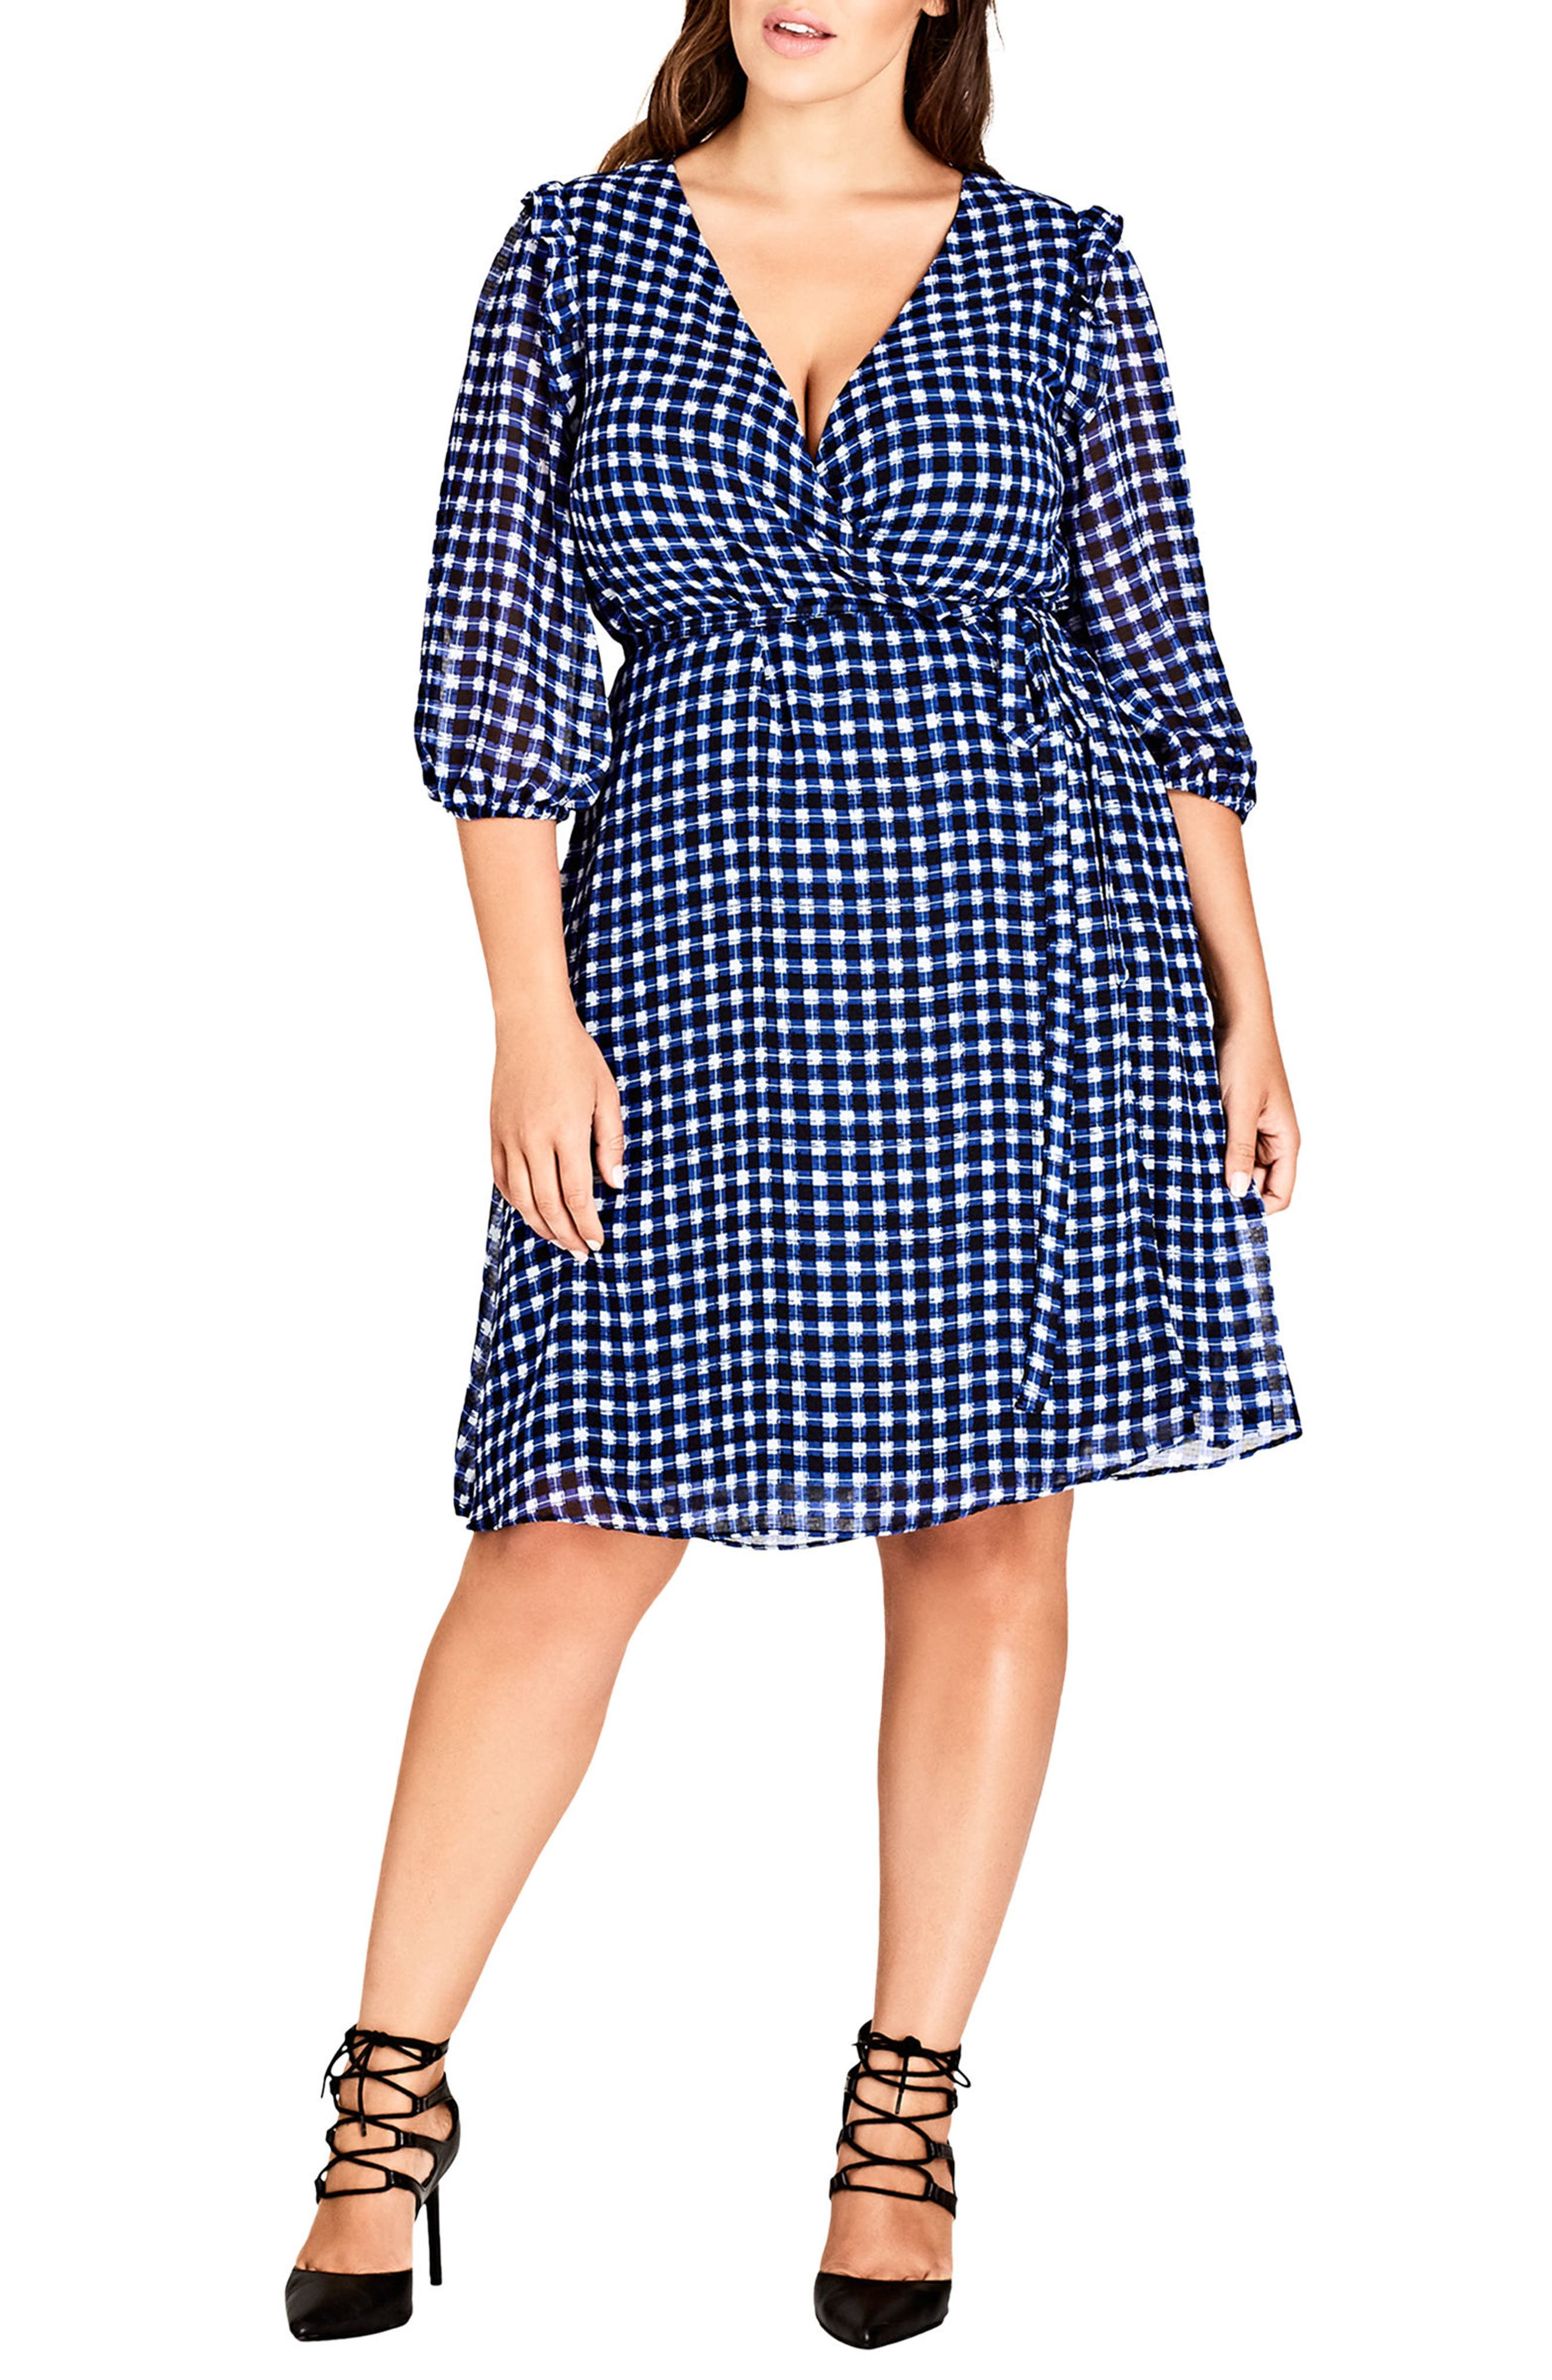 Plus Size City Chic Blue Bell Dress, Blue